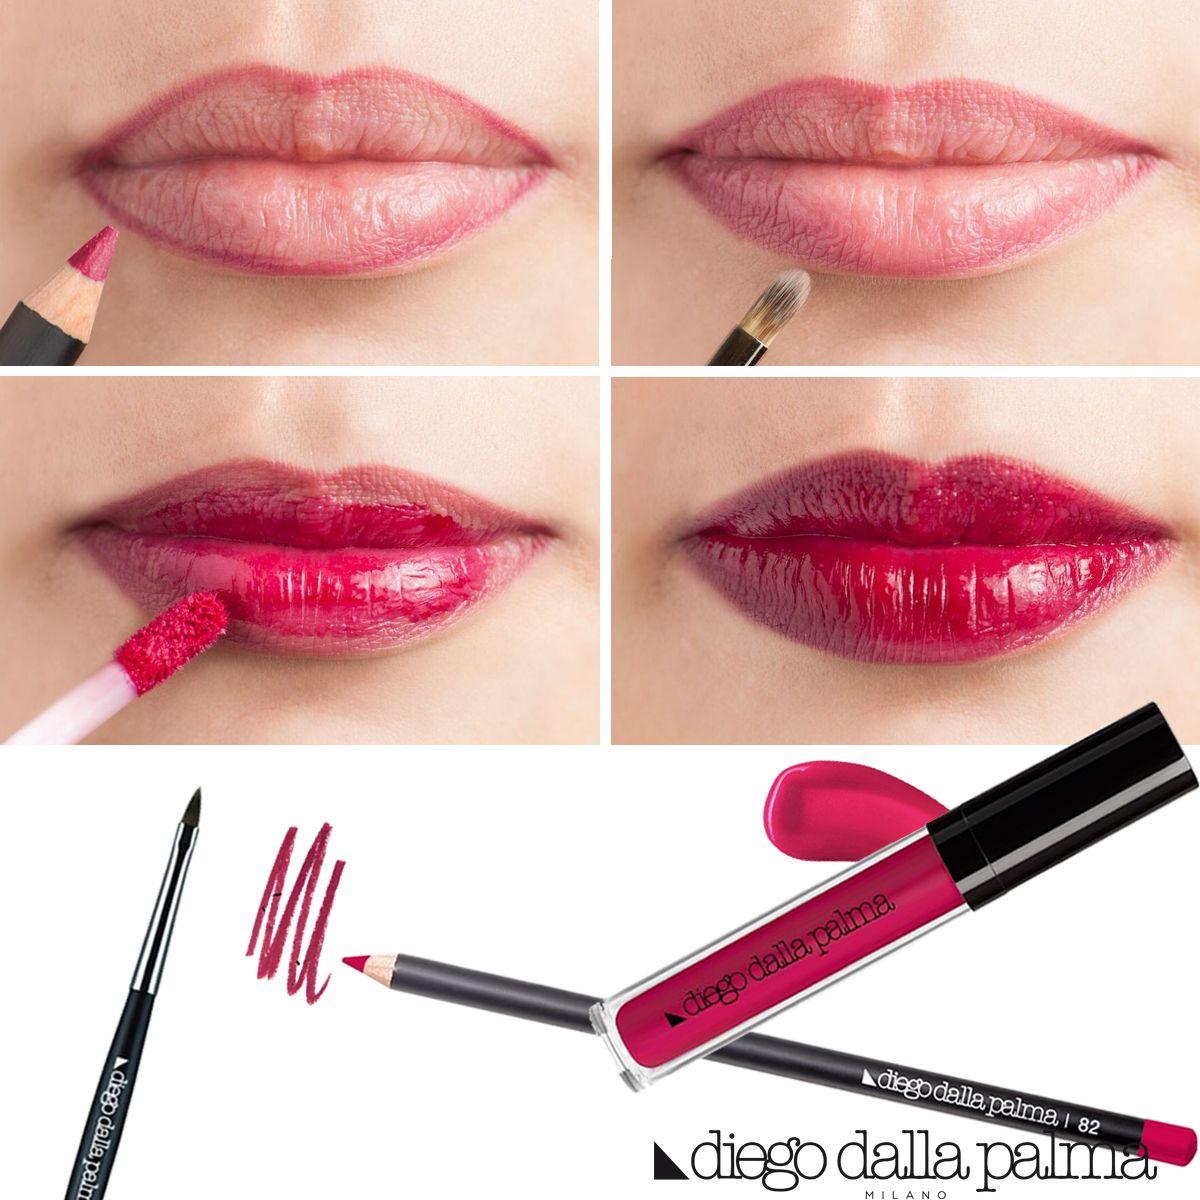 Tingilabbra lipstick tutorial by diego dalla palma milano - Diego dalla palma ...